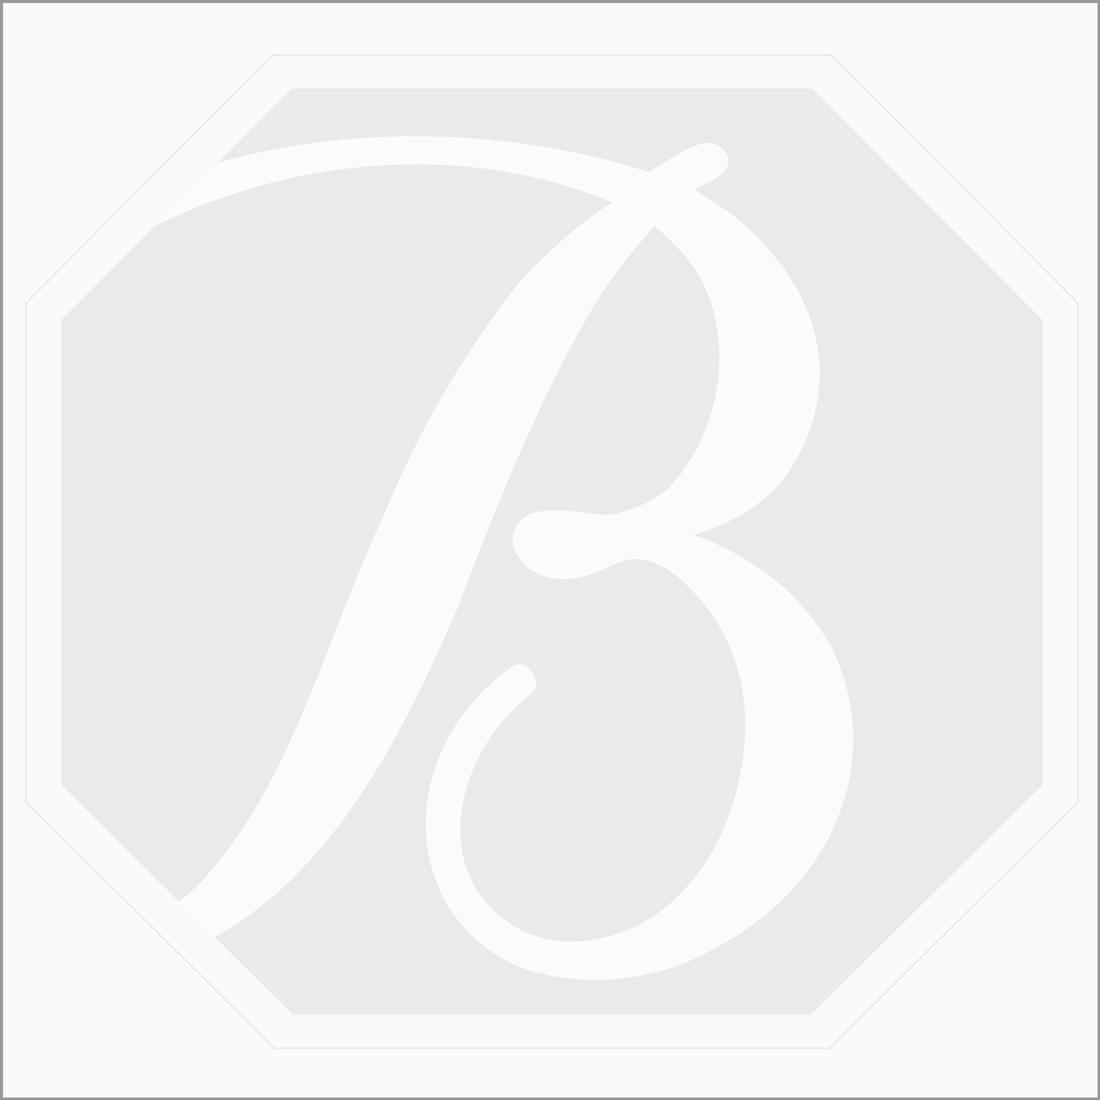 13.50 x 9.20 x 3.10 mm - Black Pear Shaped Rose Cut Diamond  - 5.60 carats (FncyDiaRC1140)